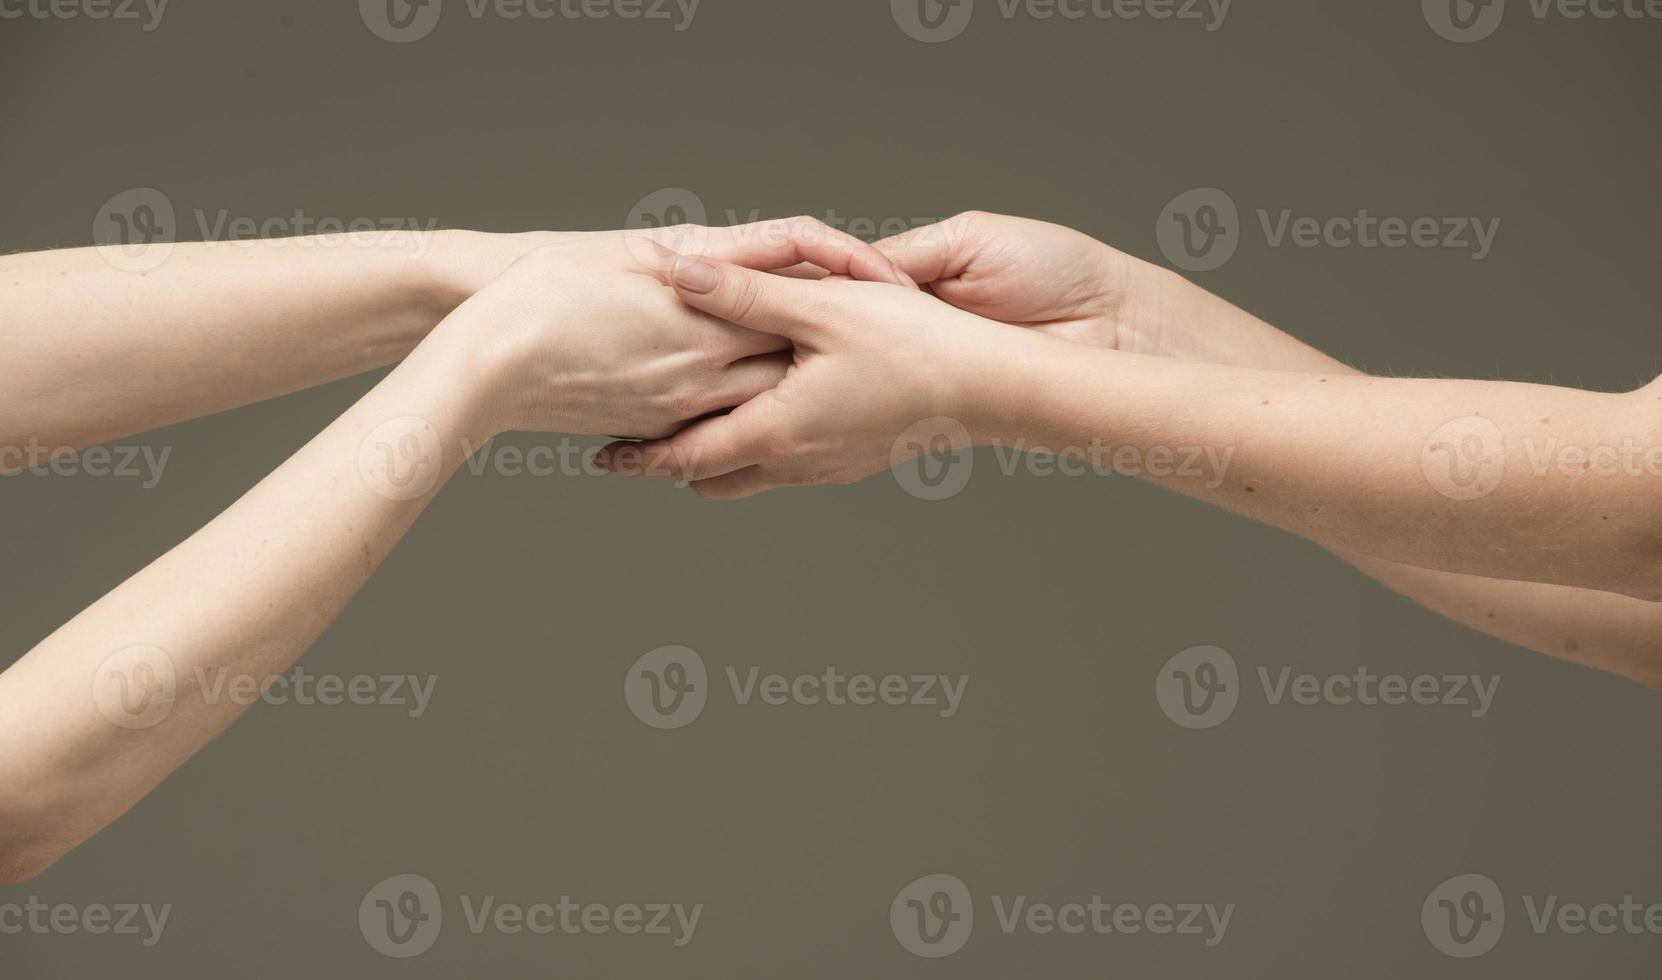 mani femminili si strofinavano a vicenda foto